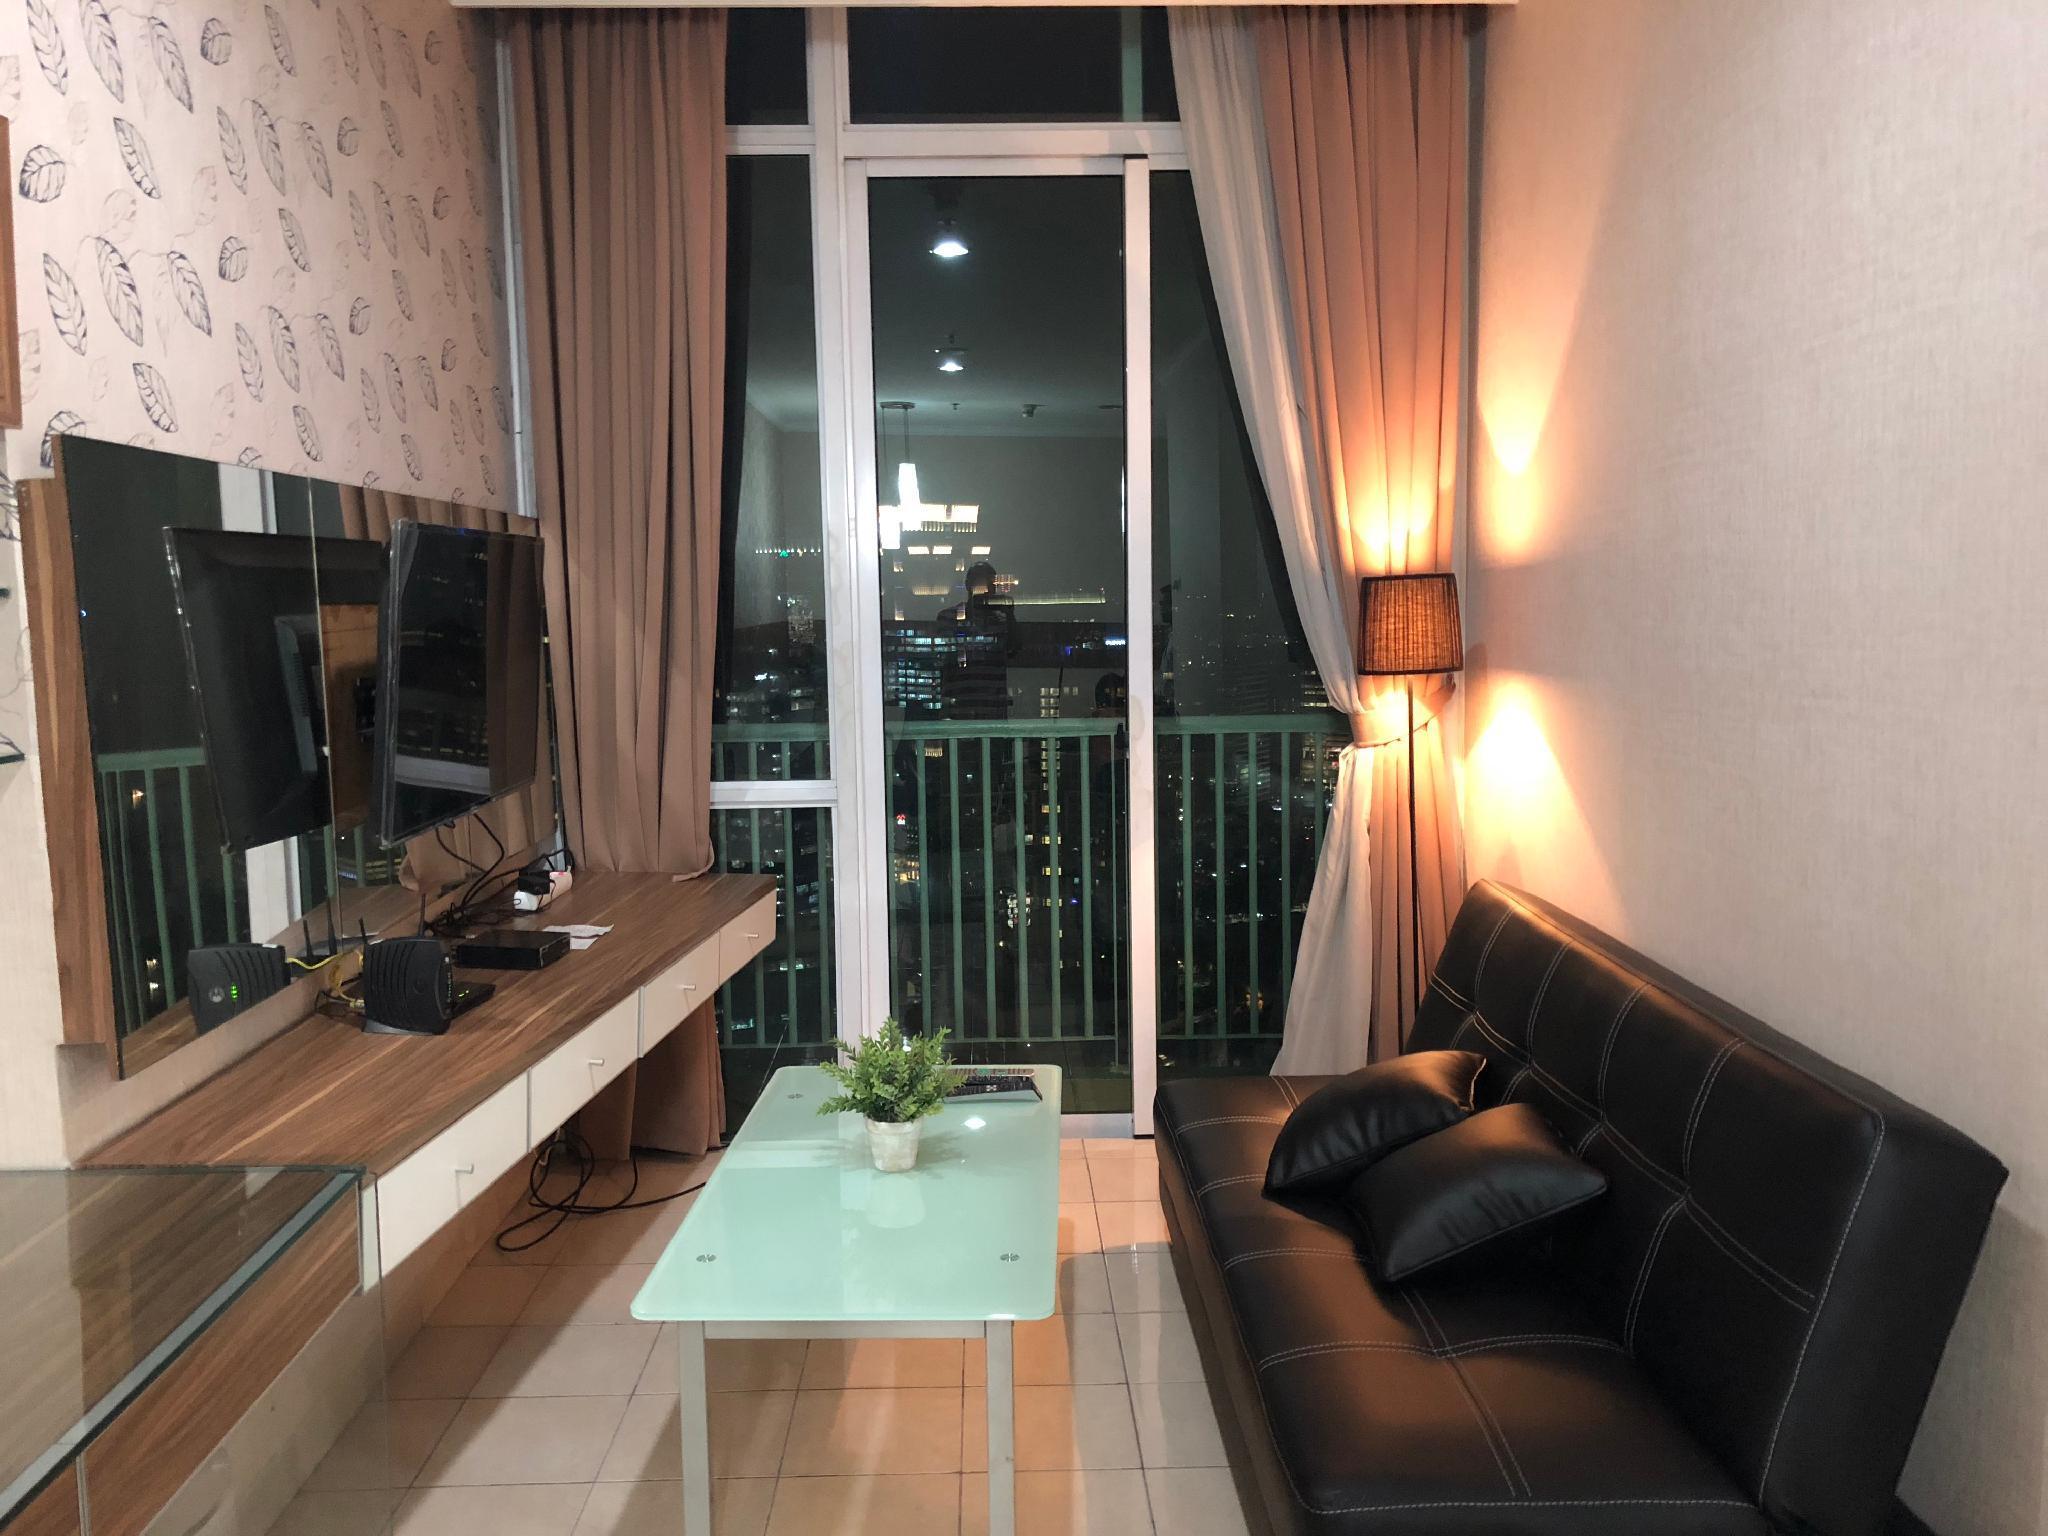 2 Bedrooms Spacious Apt @Kuningan Central Jakarta